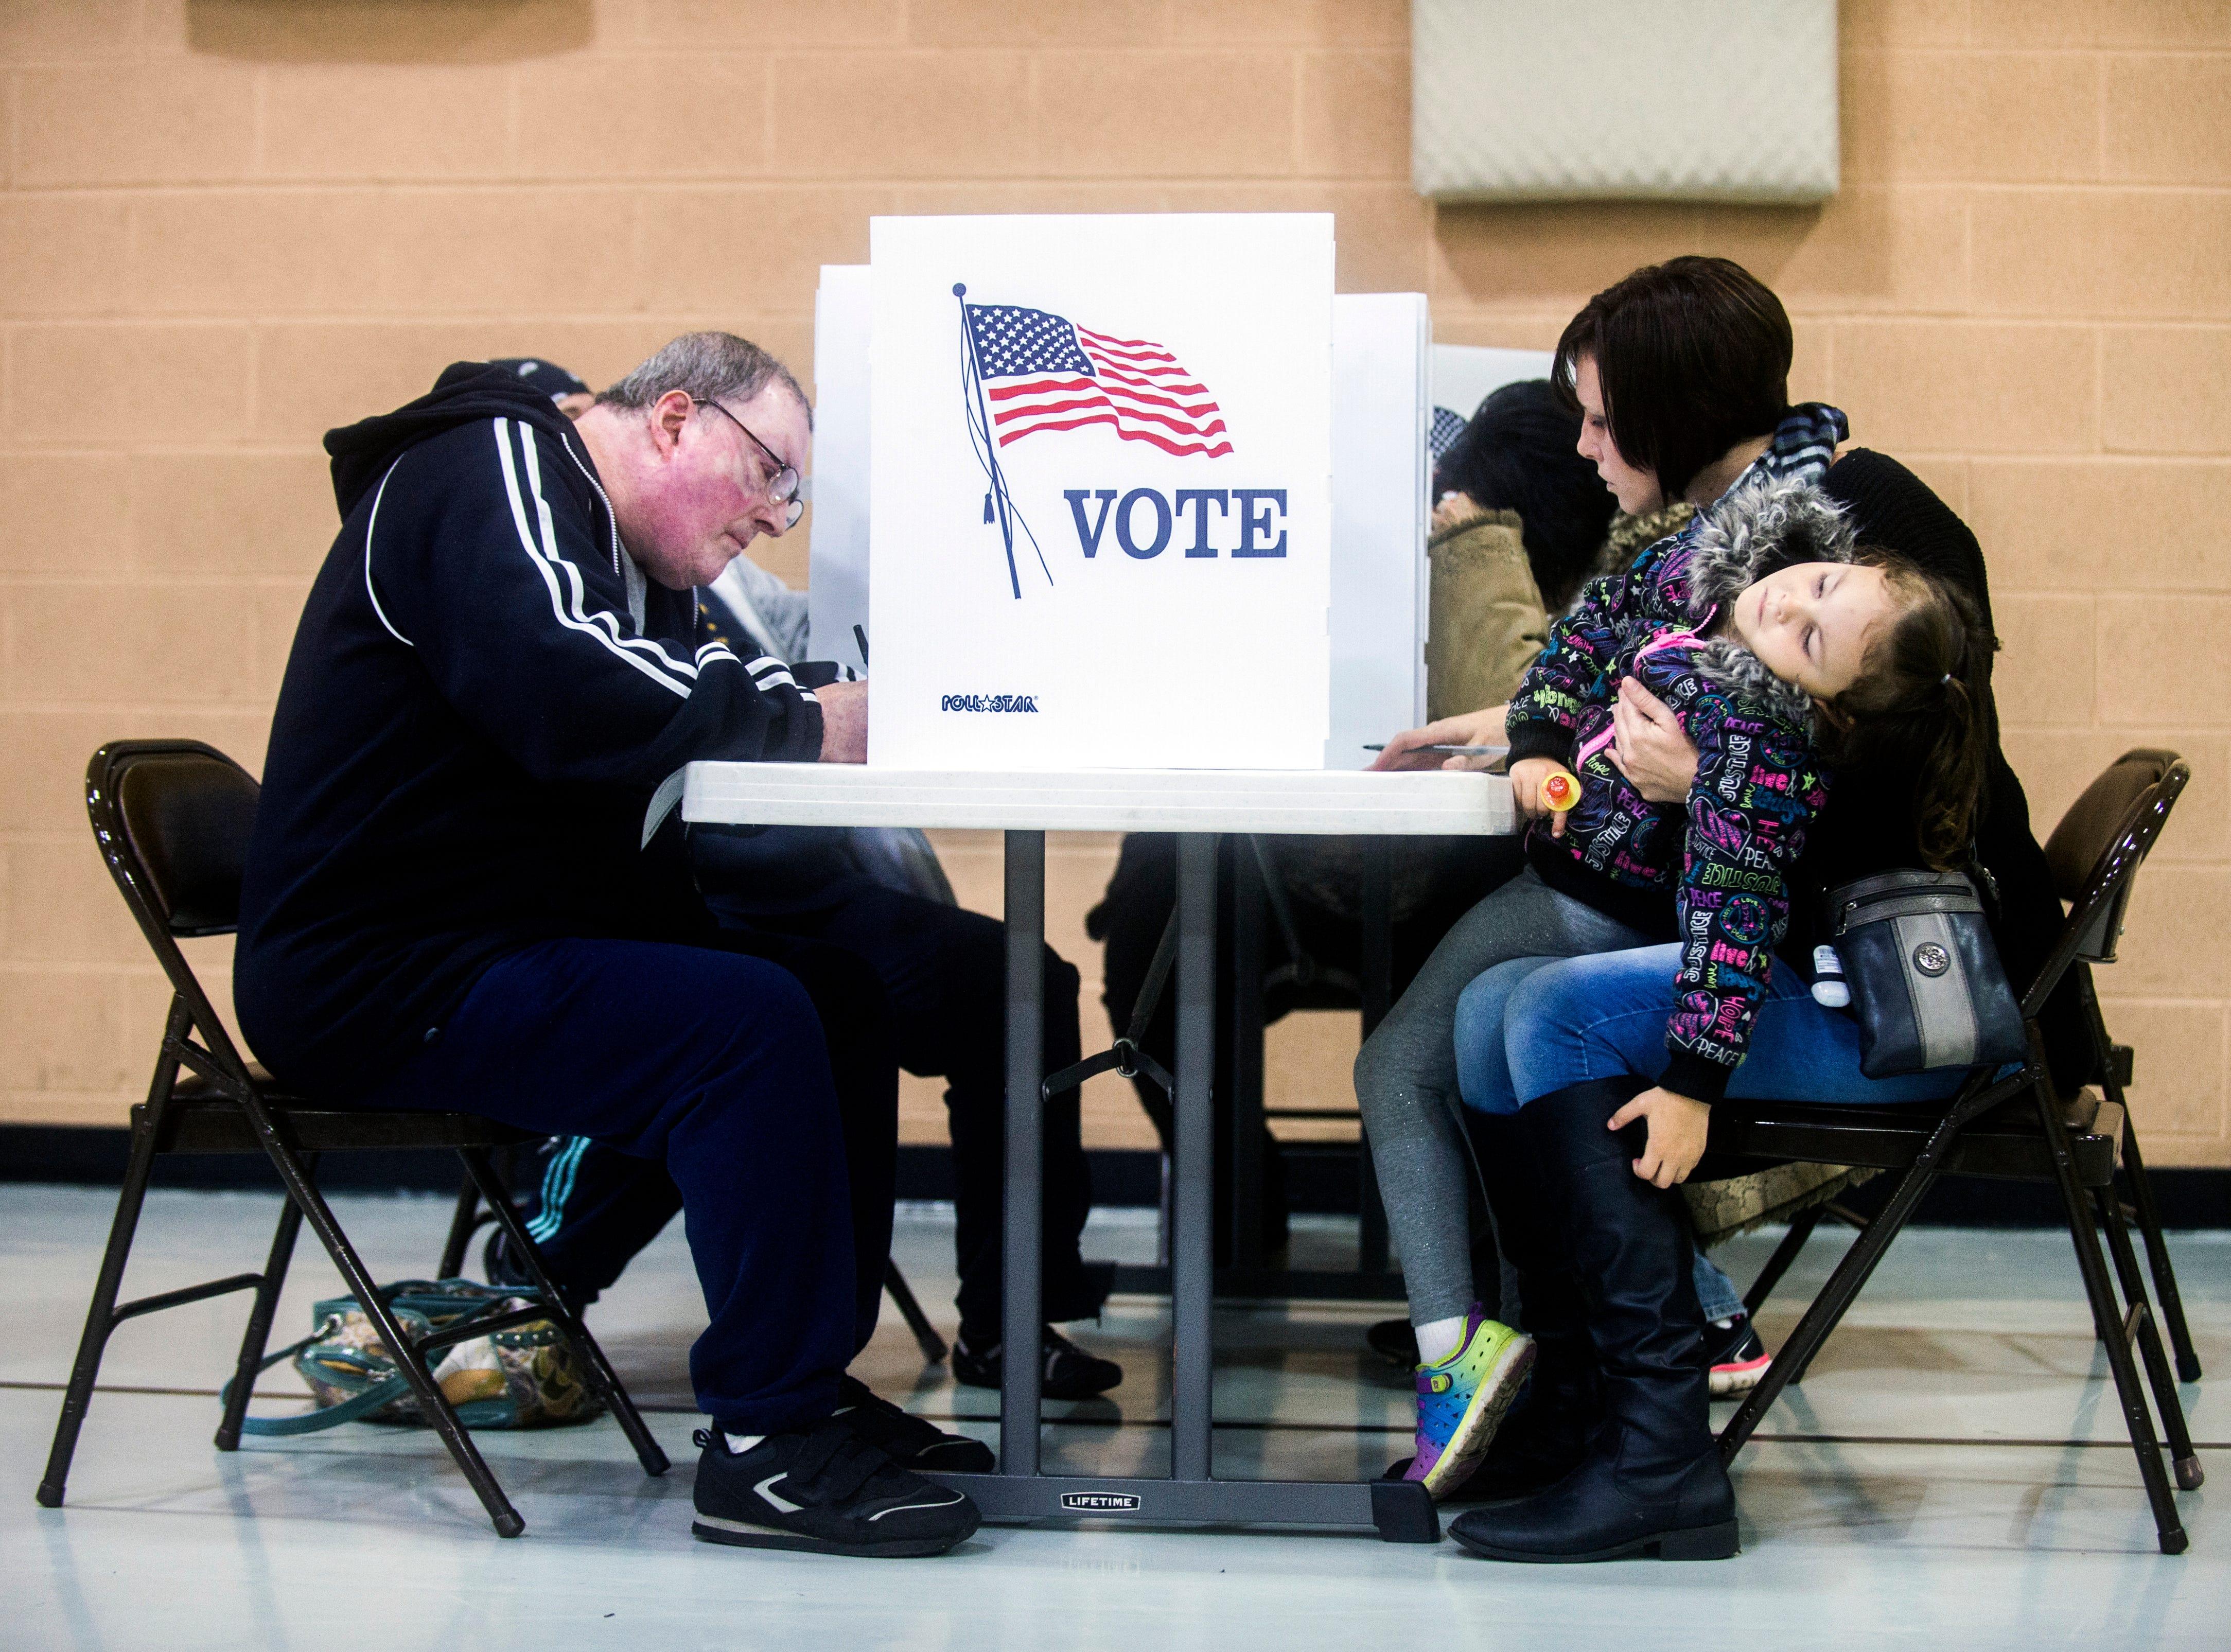 Cora Maynard, 4, grows tired as her mother, Davison resident Rachel Maynard, takes her time voting on Tuesday, Nov. 6, 2018 at First Baptist Church of Davison, Michigan.